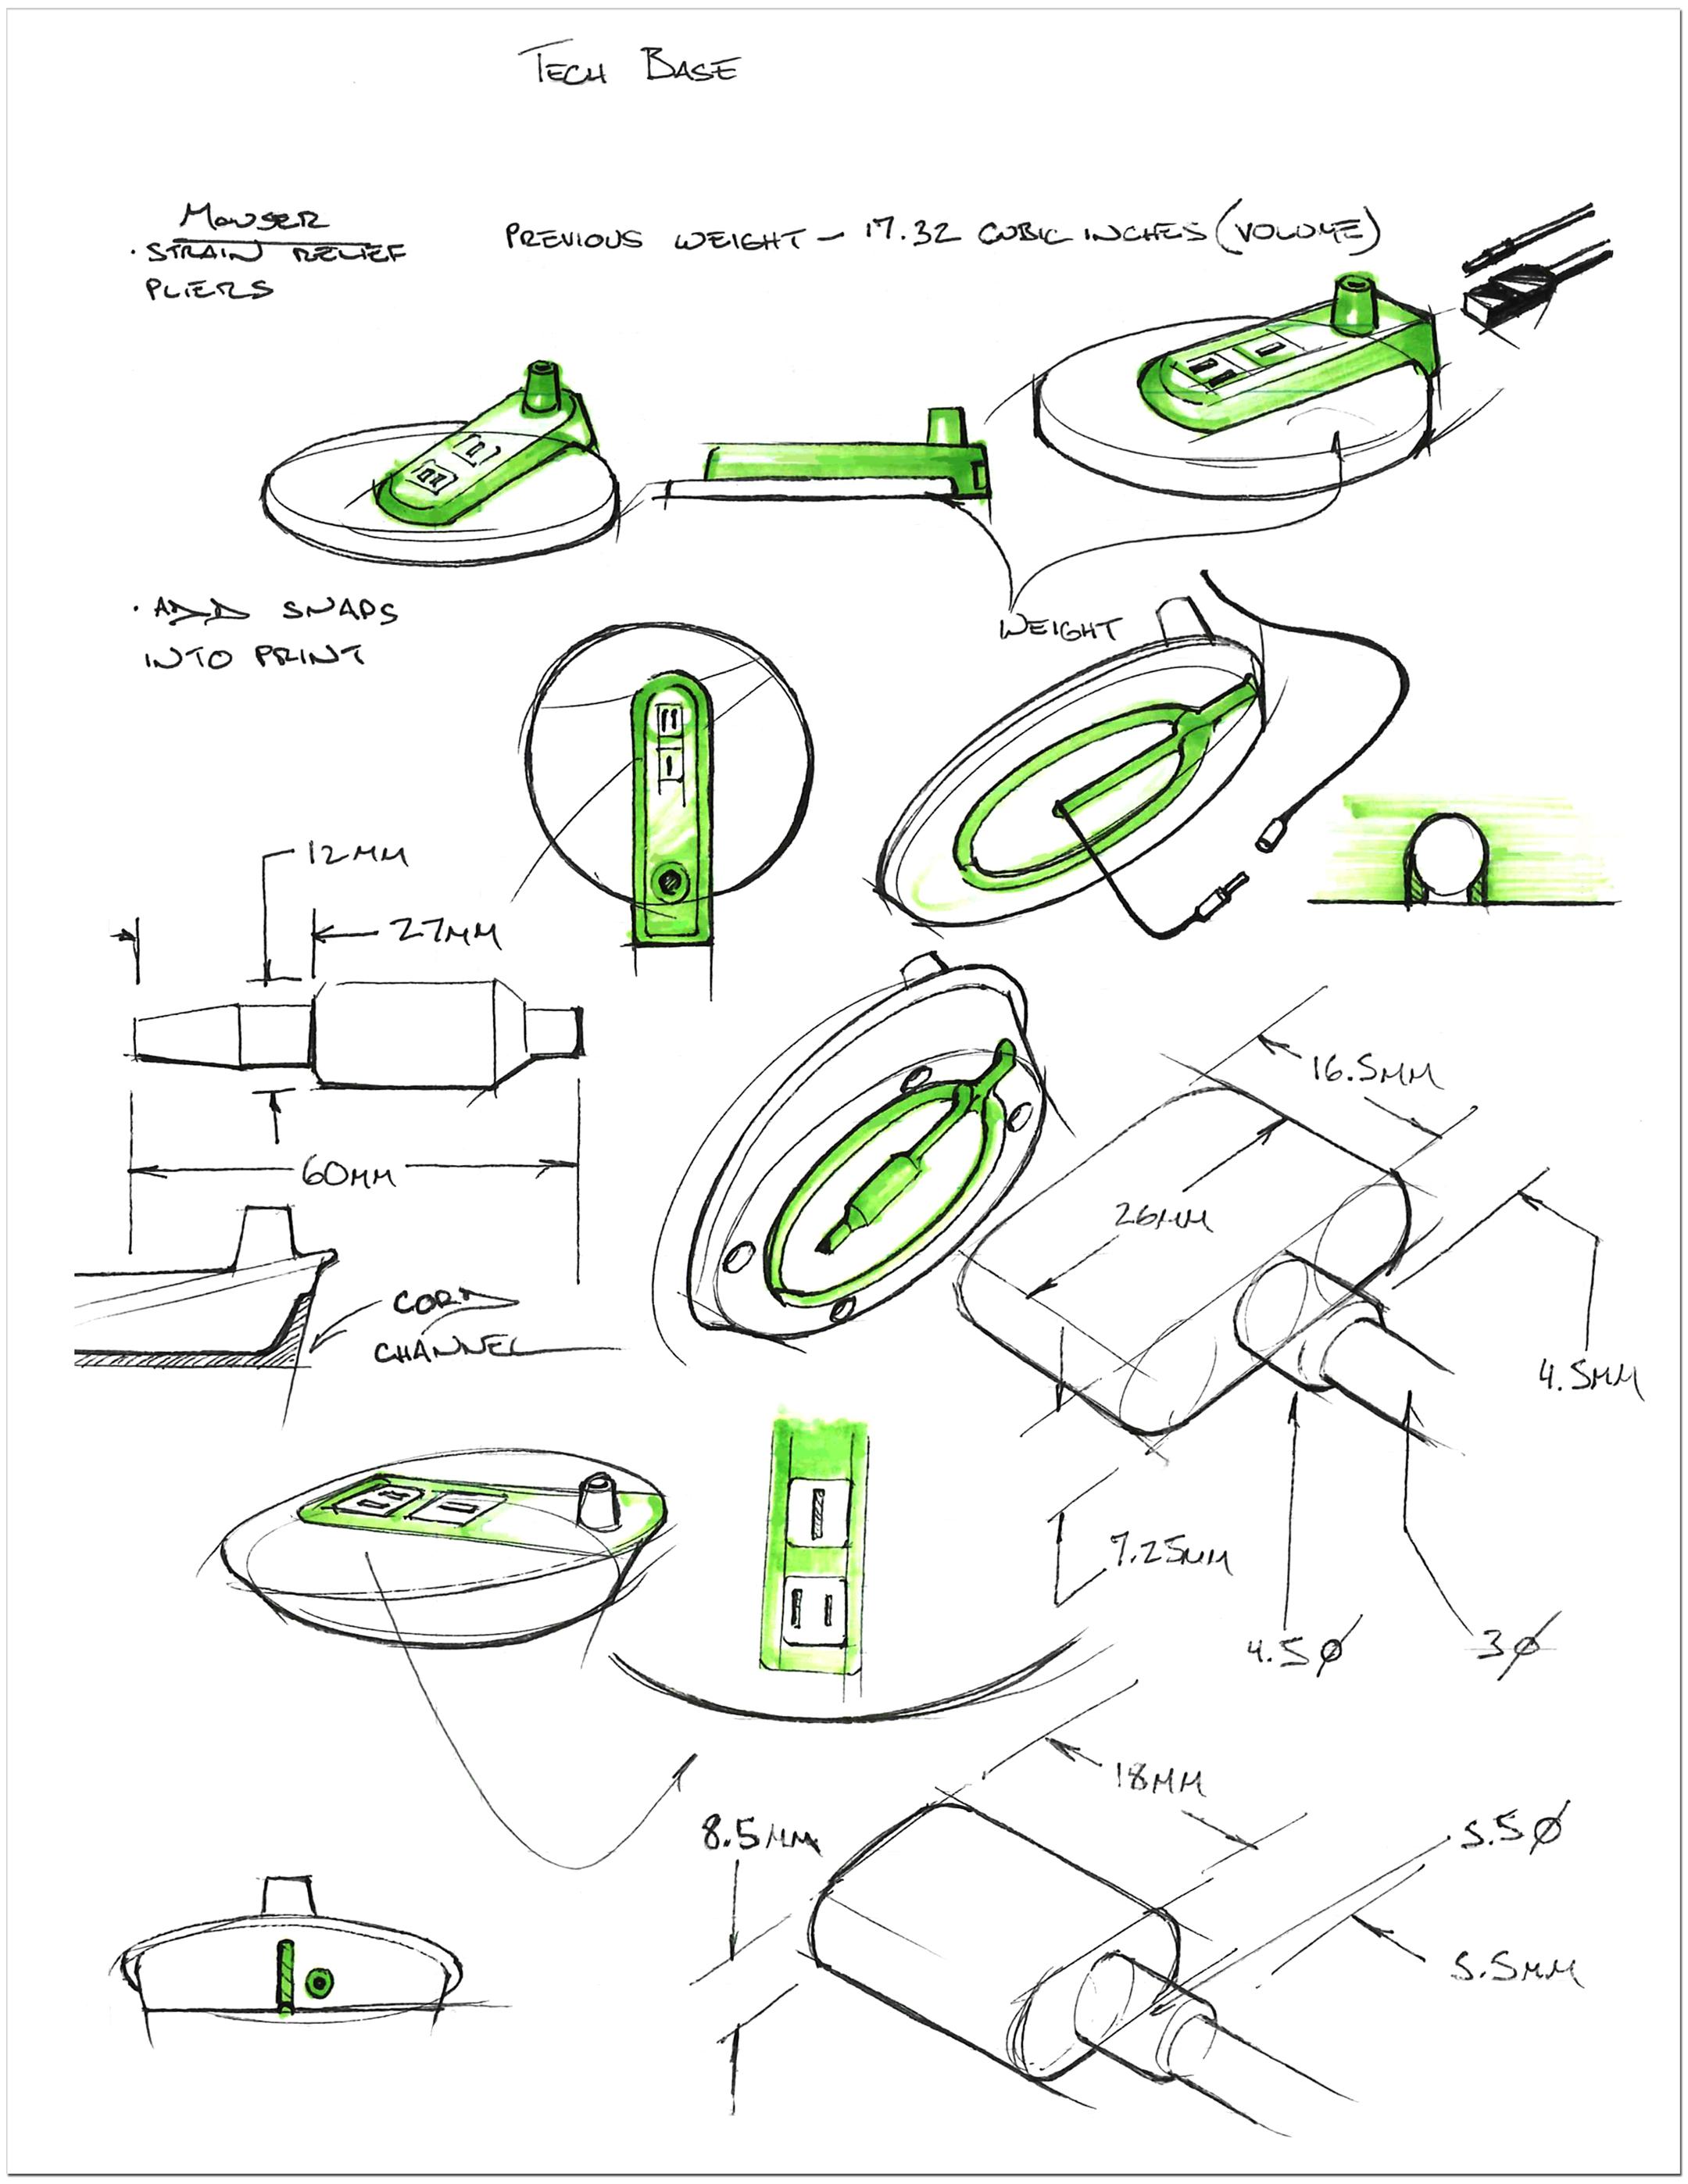 120807_Tech-base-sketchbook_shadpw01.jpg